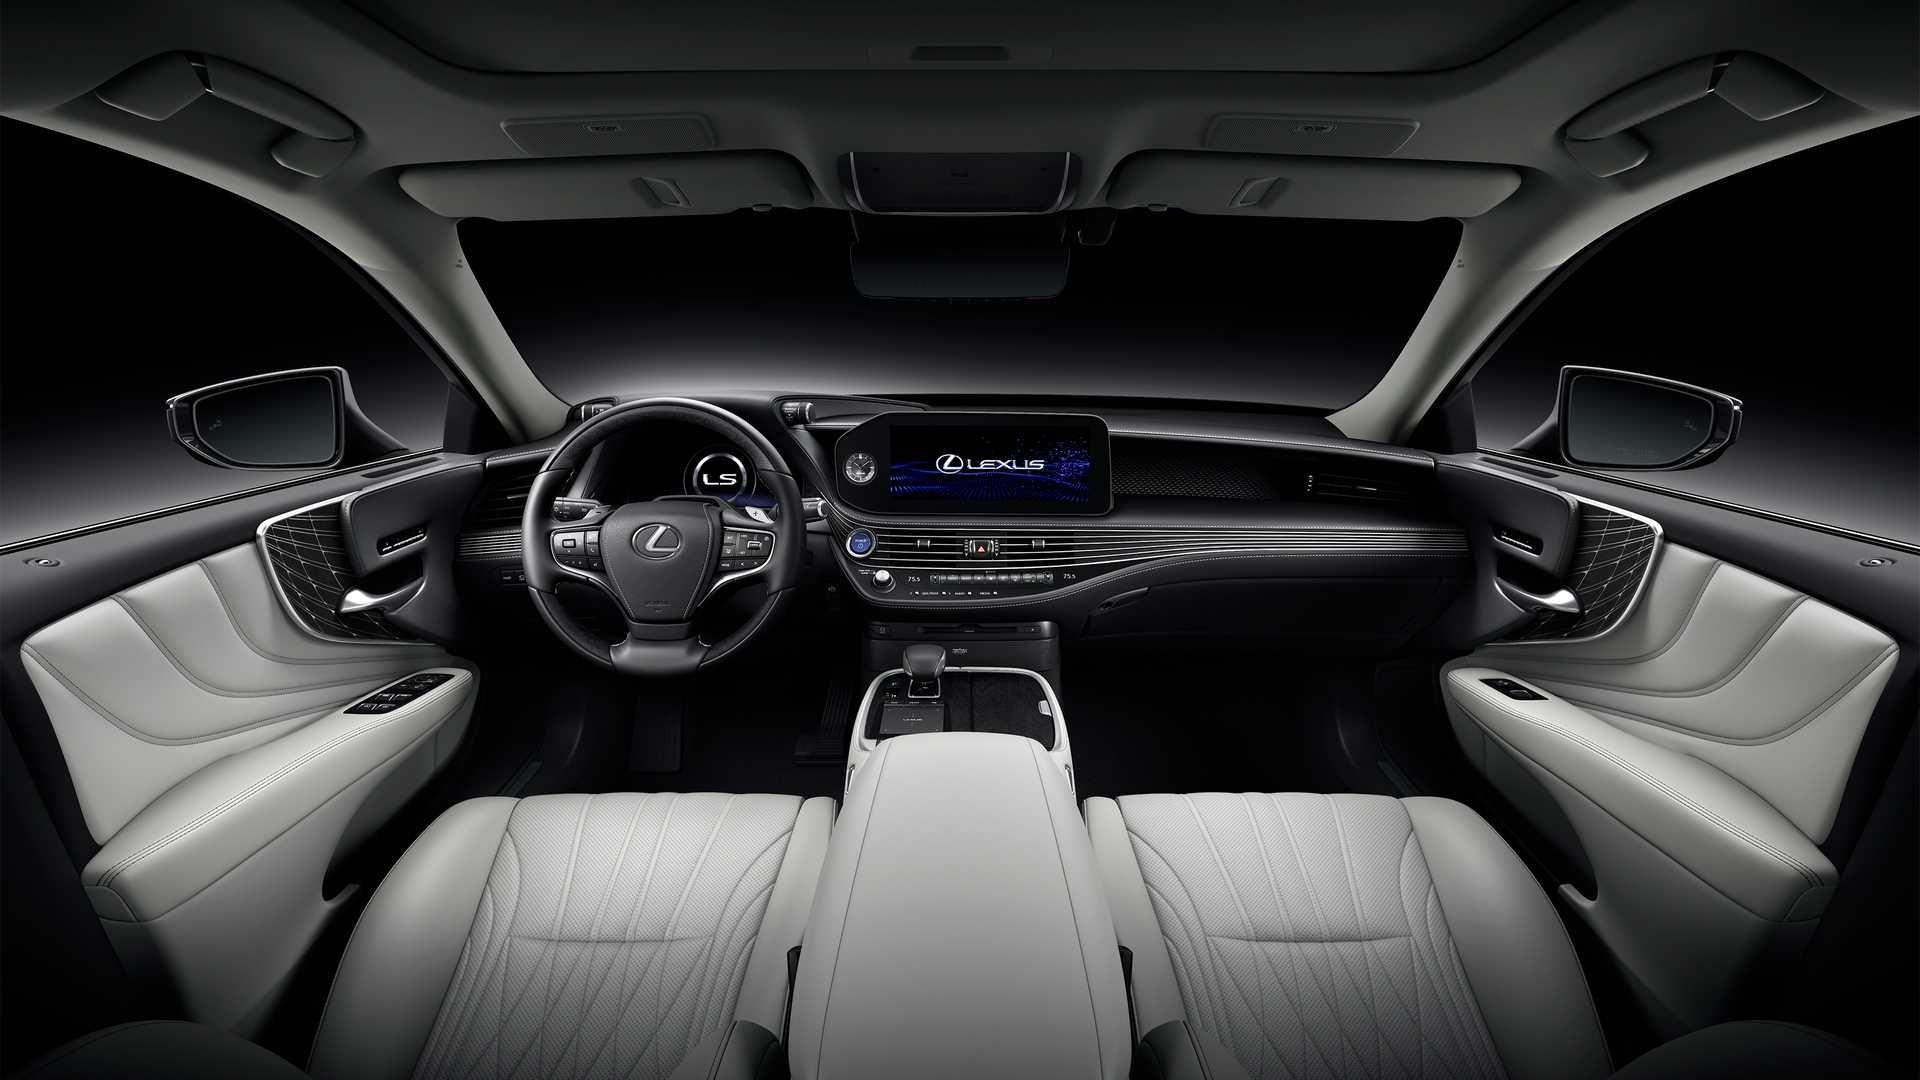 2021 Lexus Ls Arrives With New Looks Self Driving Tech Peugeot 2008 Peugeot Lamborghini